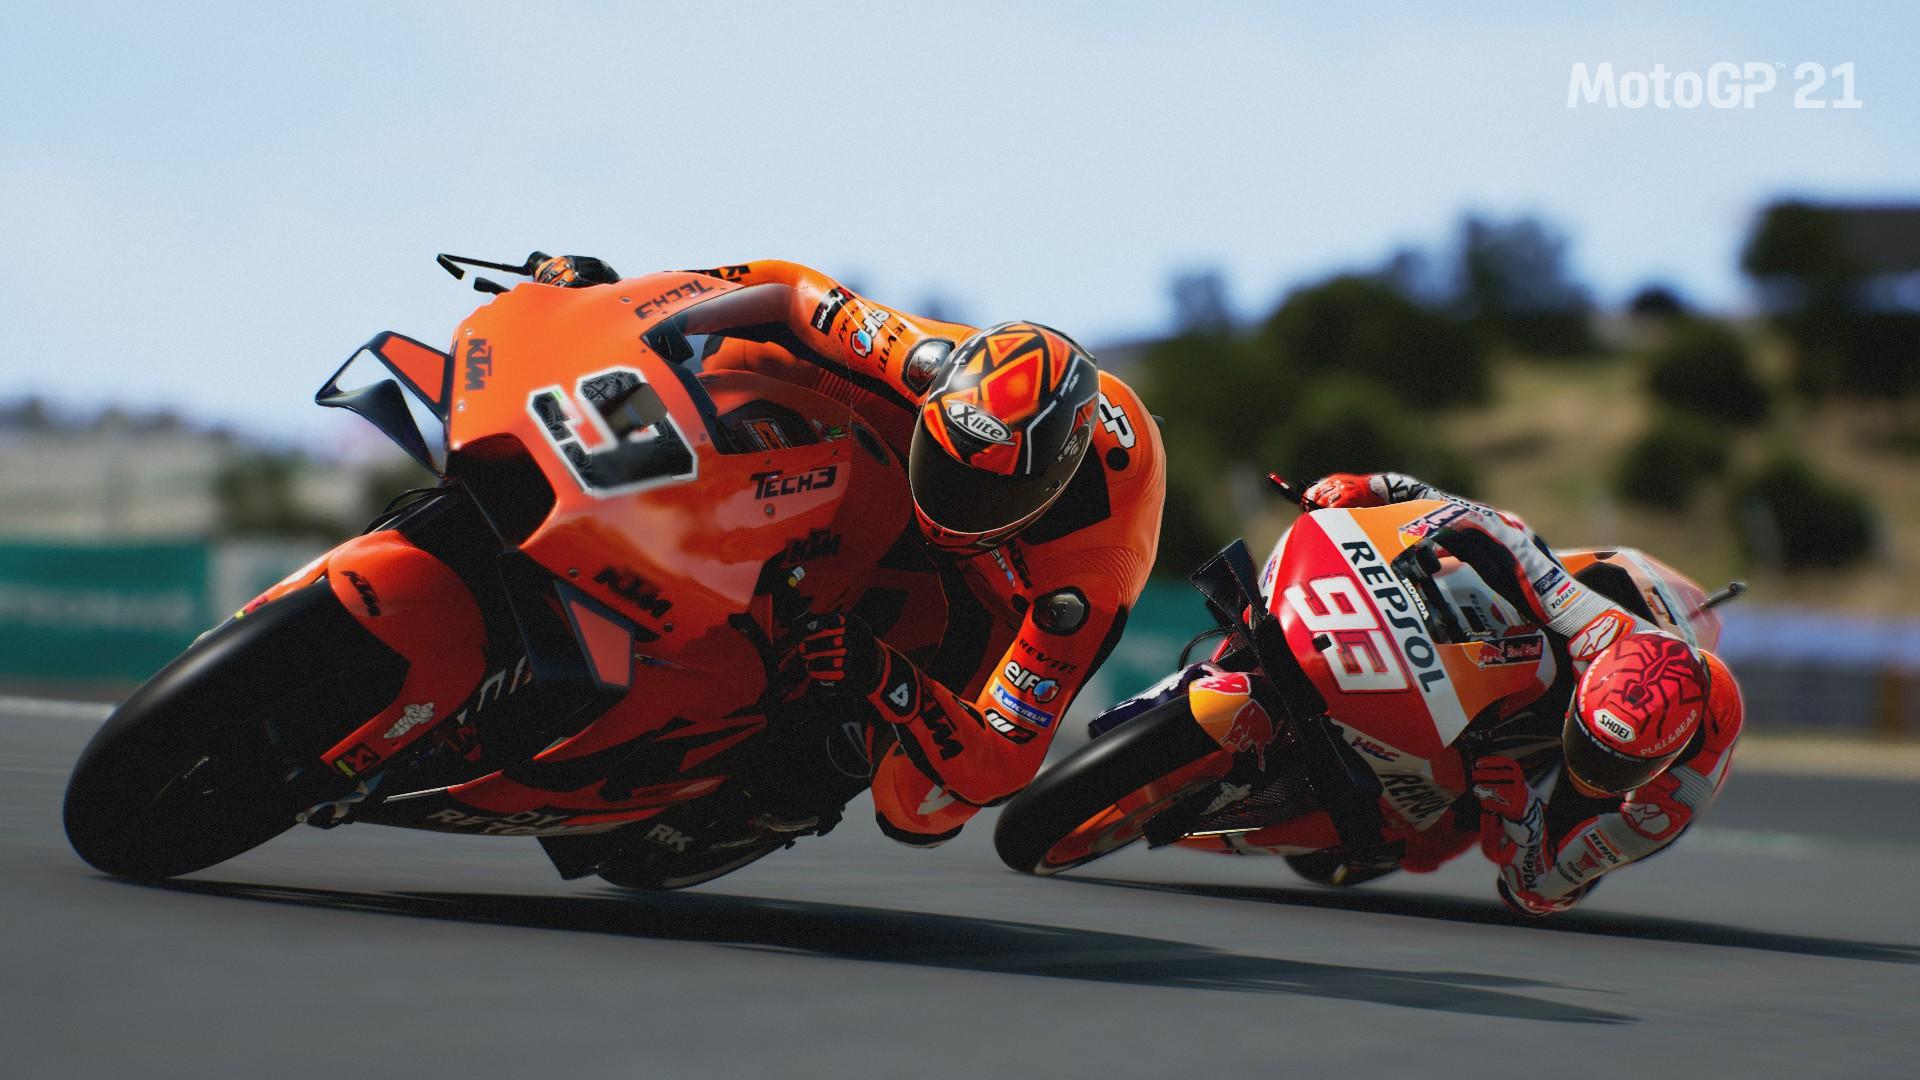 General 1920x1080 Moto GP motorcycle Racing Motorcycle racing Marc Marquez Wheelie Speed Design Yamaha Honda sport  sports Motorsport vehicle